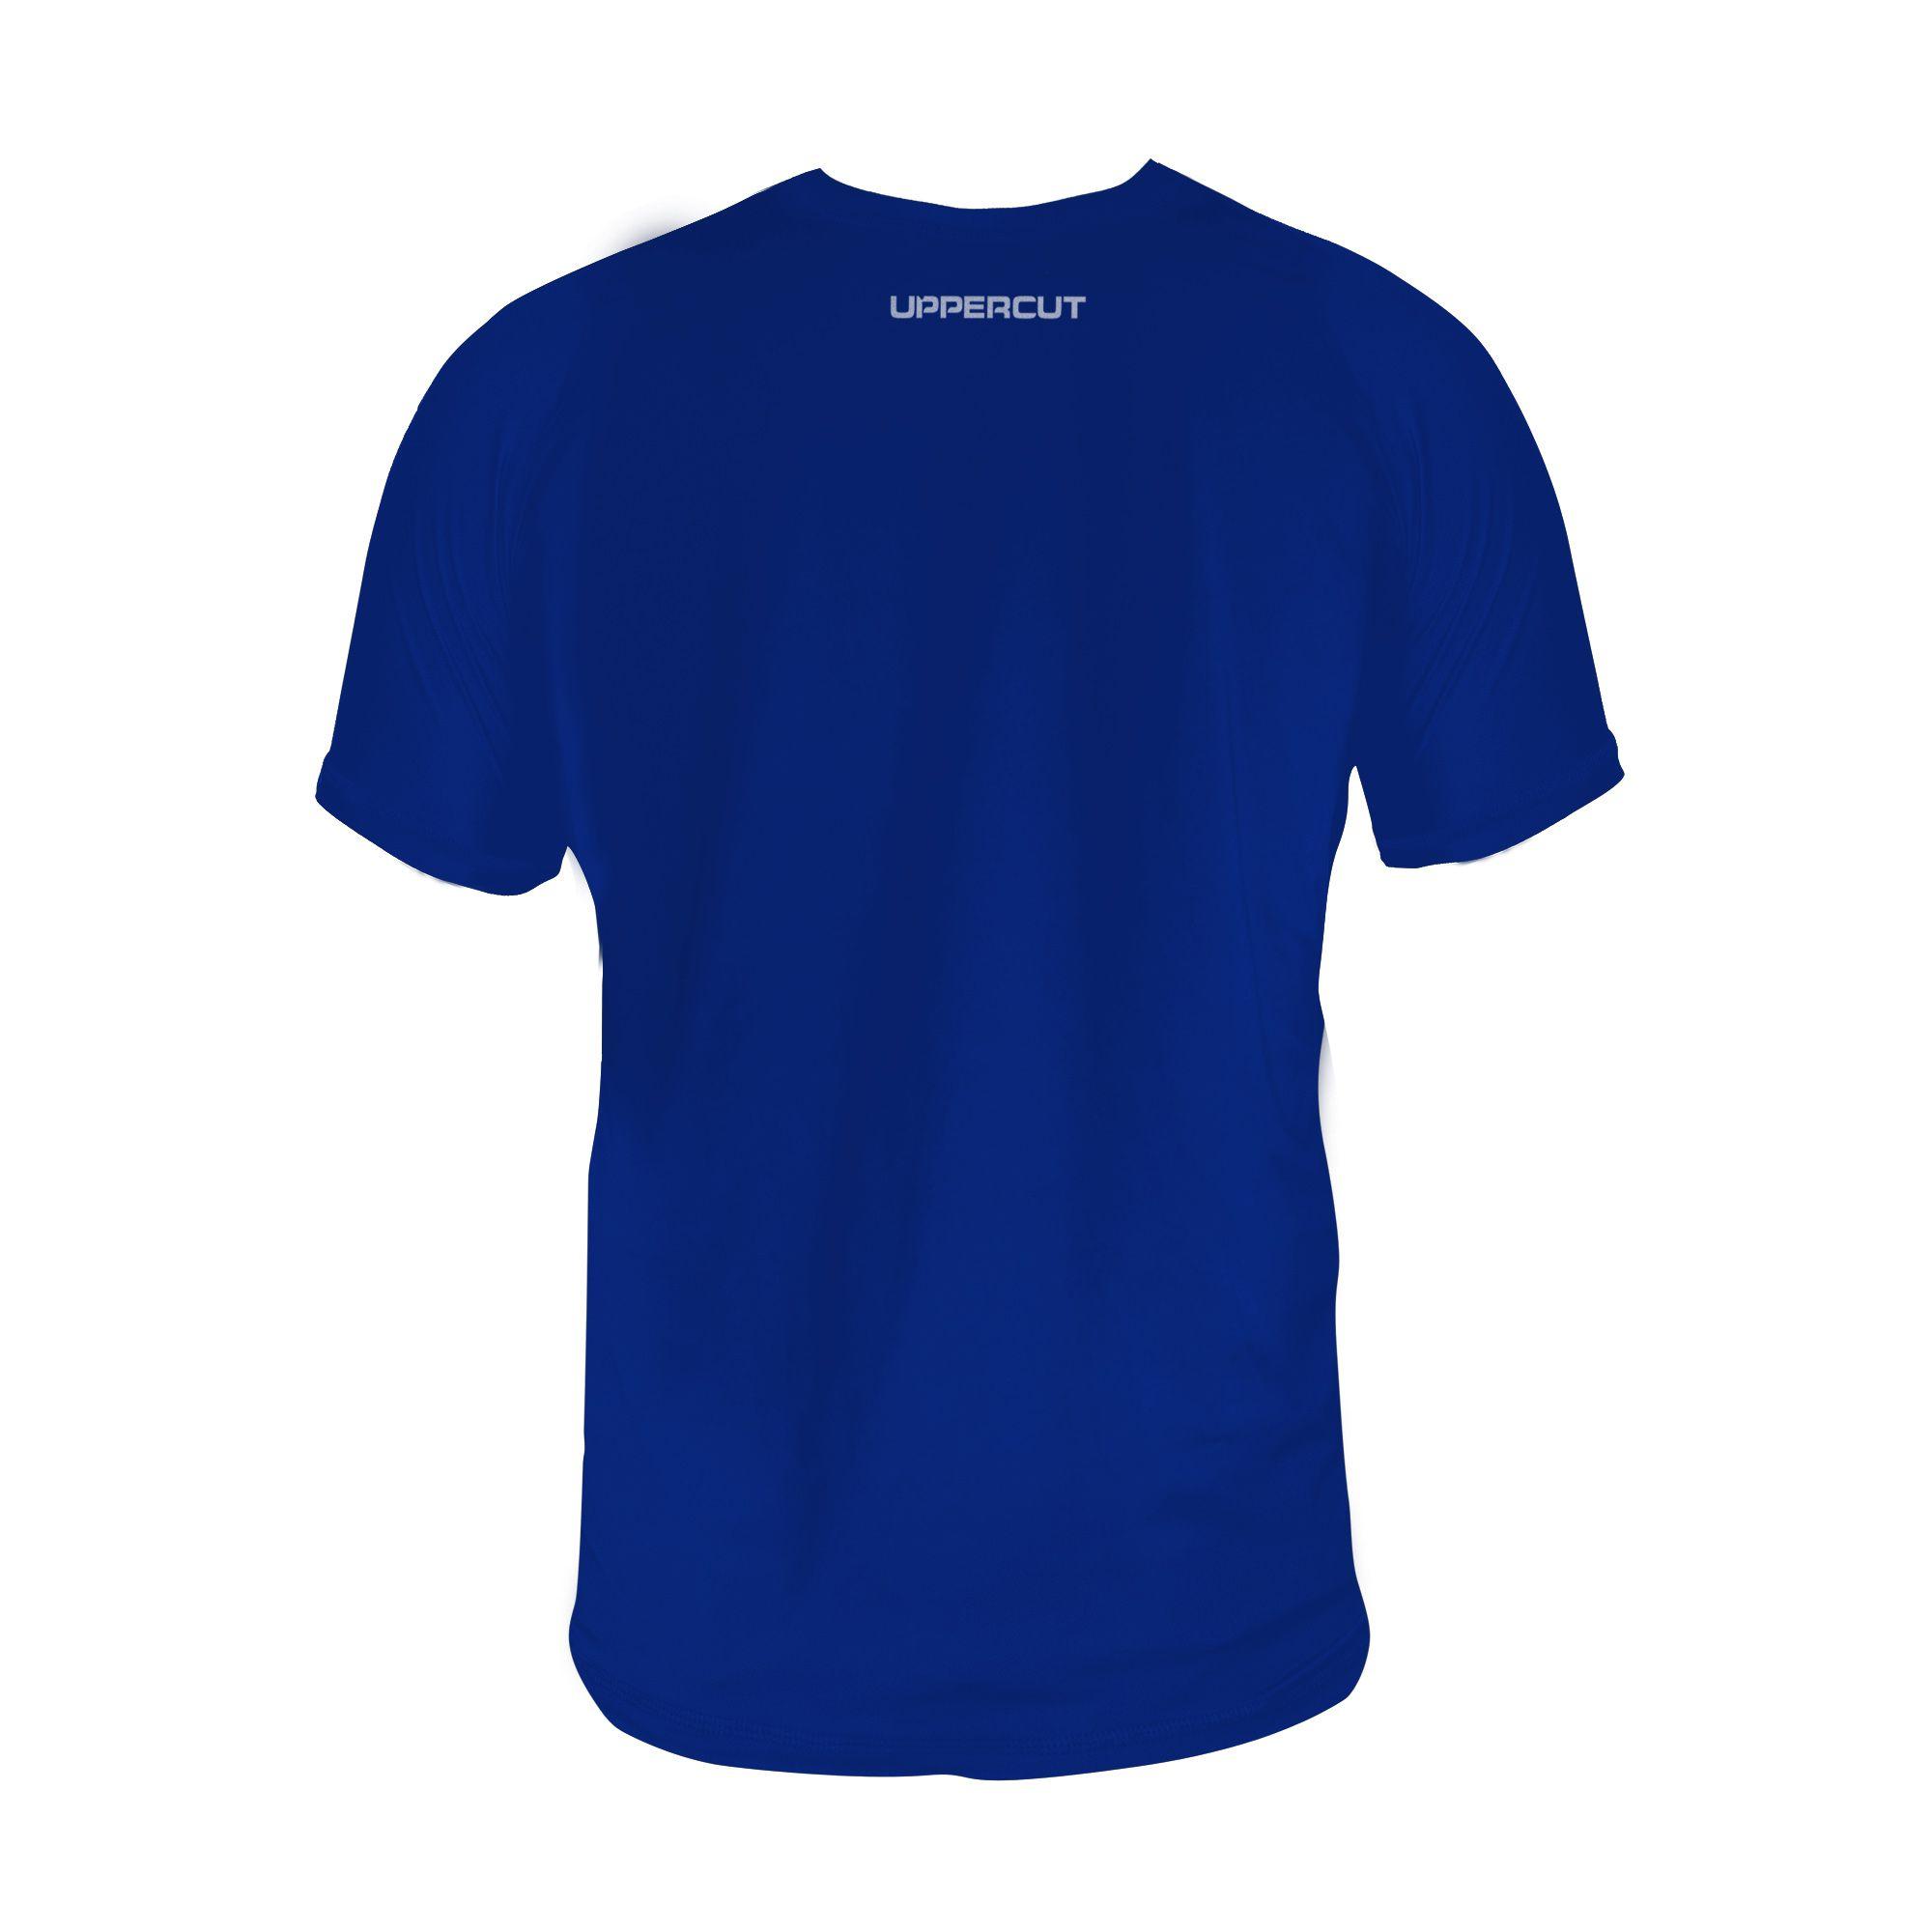 Camiseta Capoeira Ginga U-159 - Treino Dry Fit UV50+ Azul